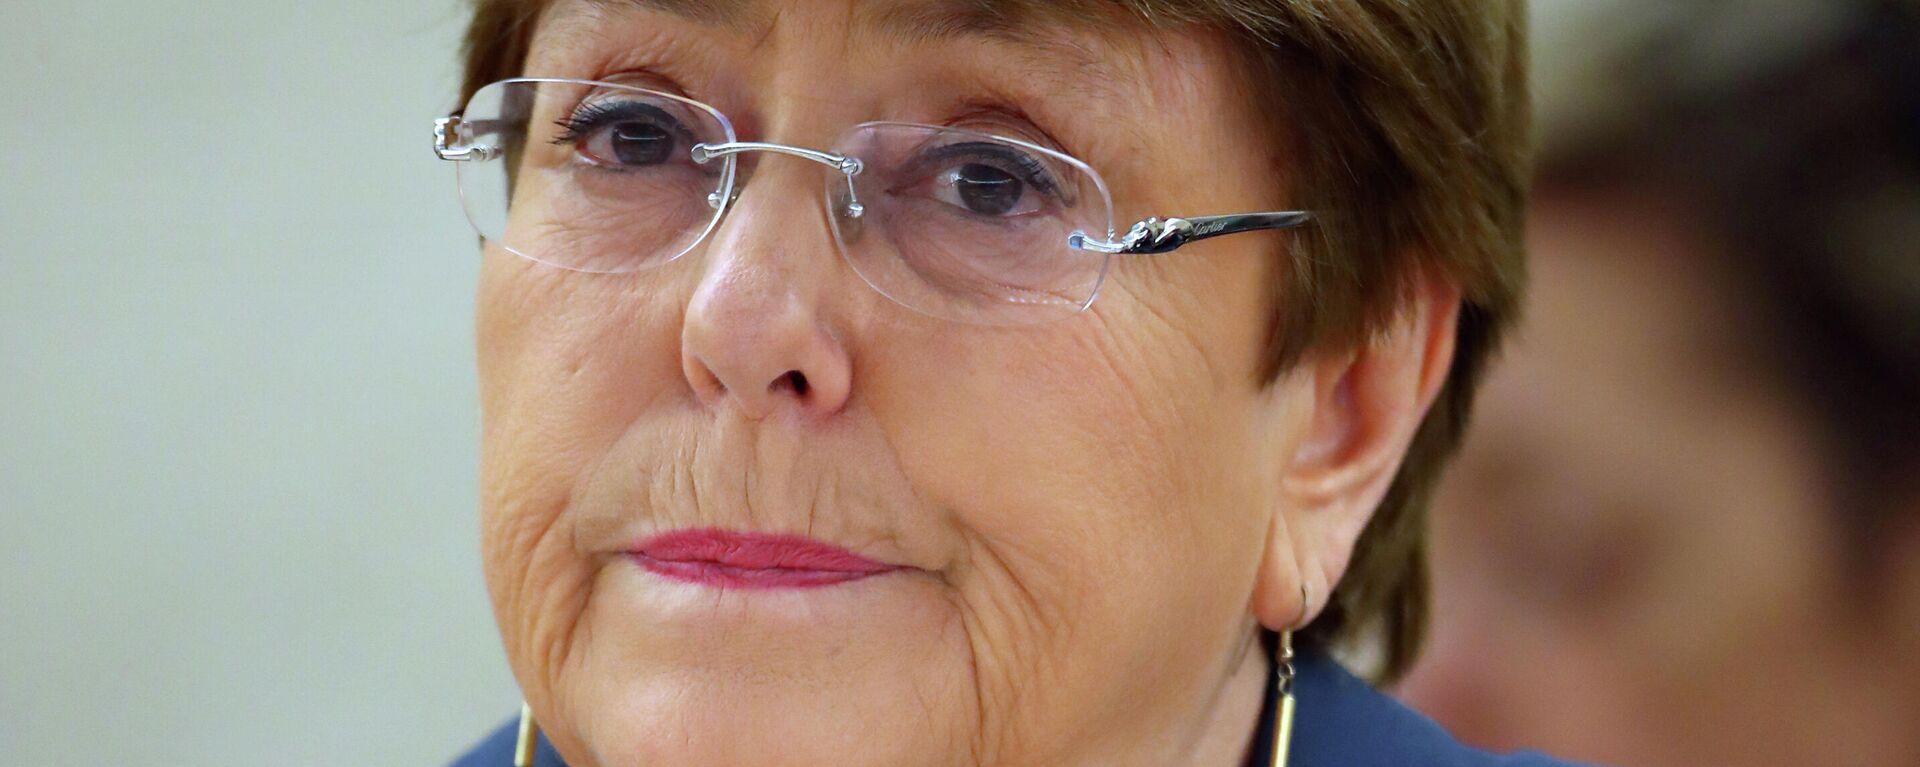 Michelle Bachelet, Alta Comisionada de la ONU para los DDHH - Sputnik Mundo, 1920, 21.07.2021